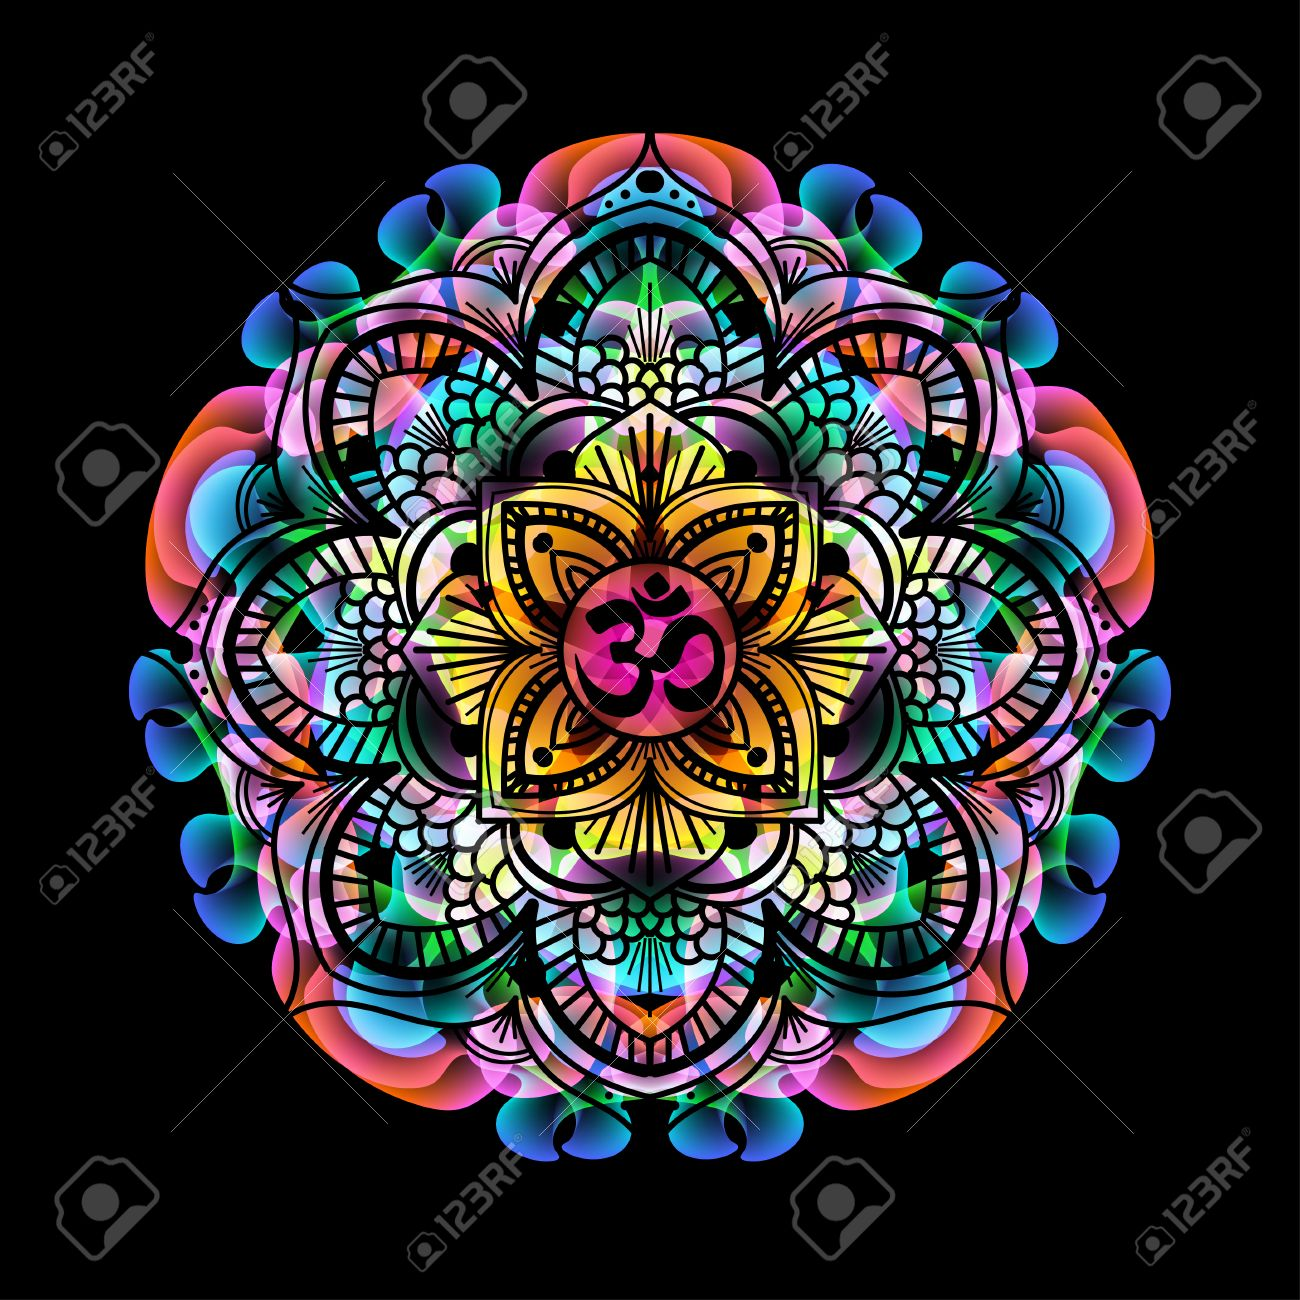 mandala - circle decorative spiritual indian symbol with OM sign